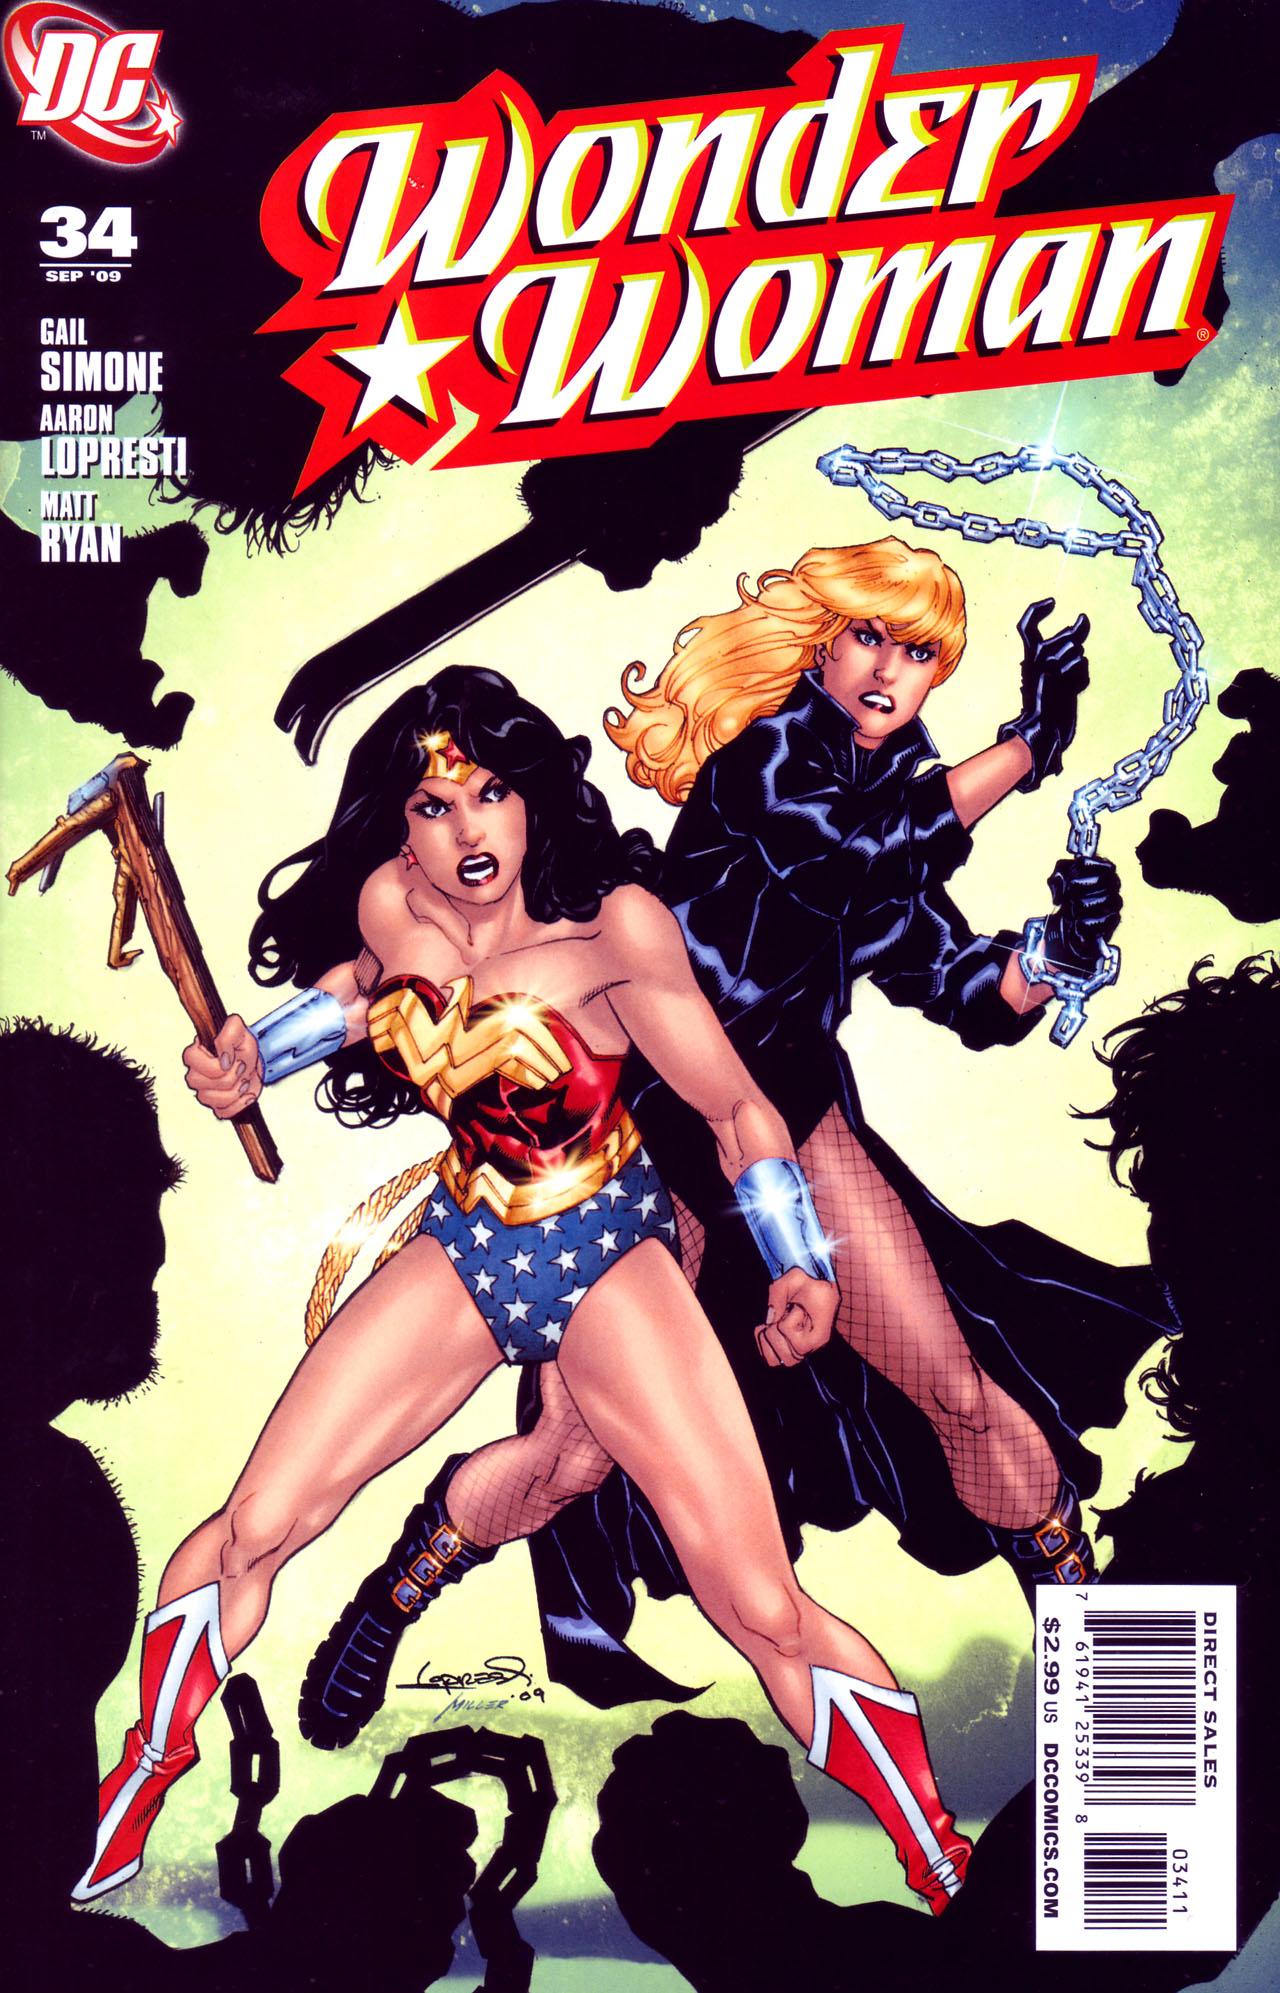 Read online Wonder Woman (2006) comic -  Issue #34 - 1